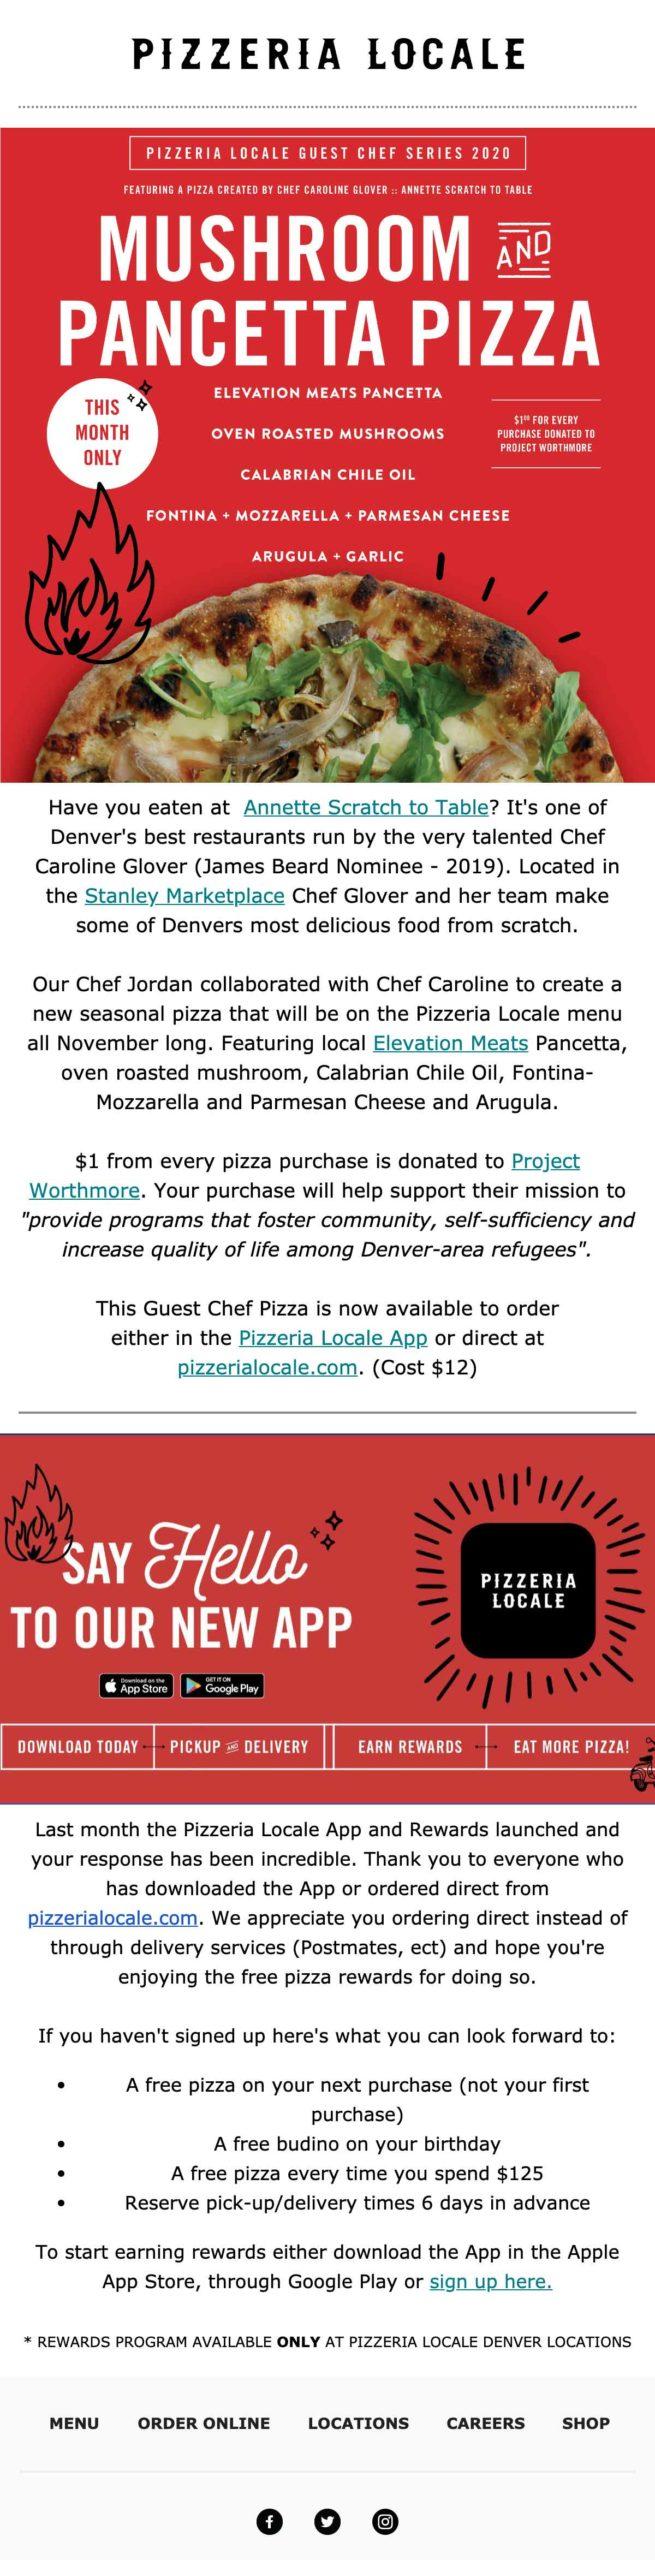 Pizzeria Locale new app email